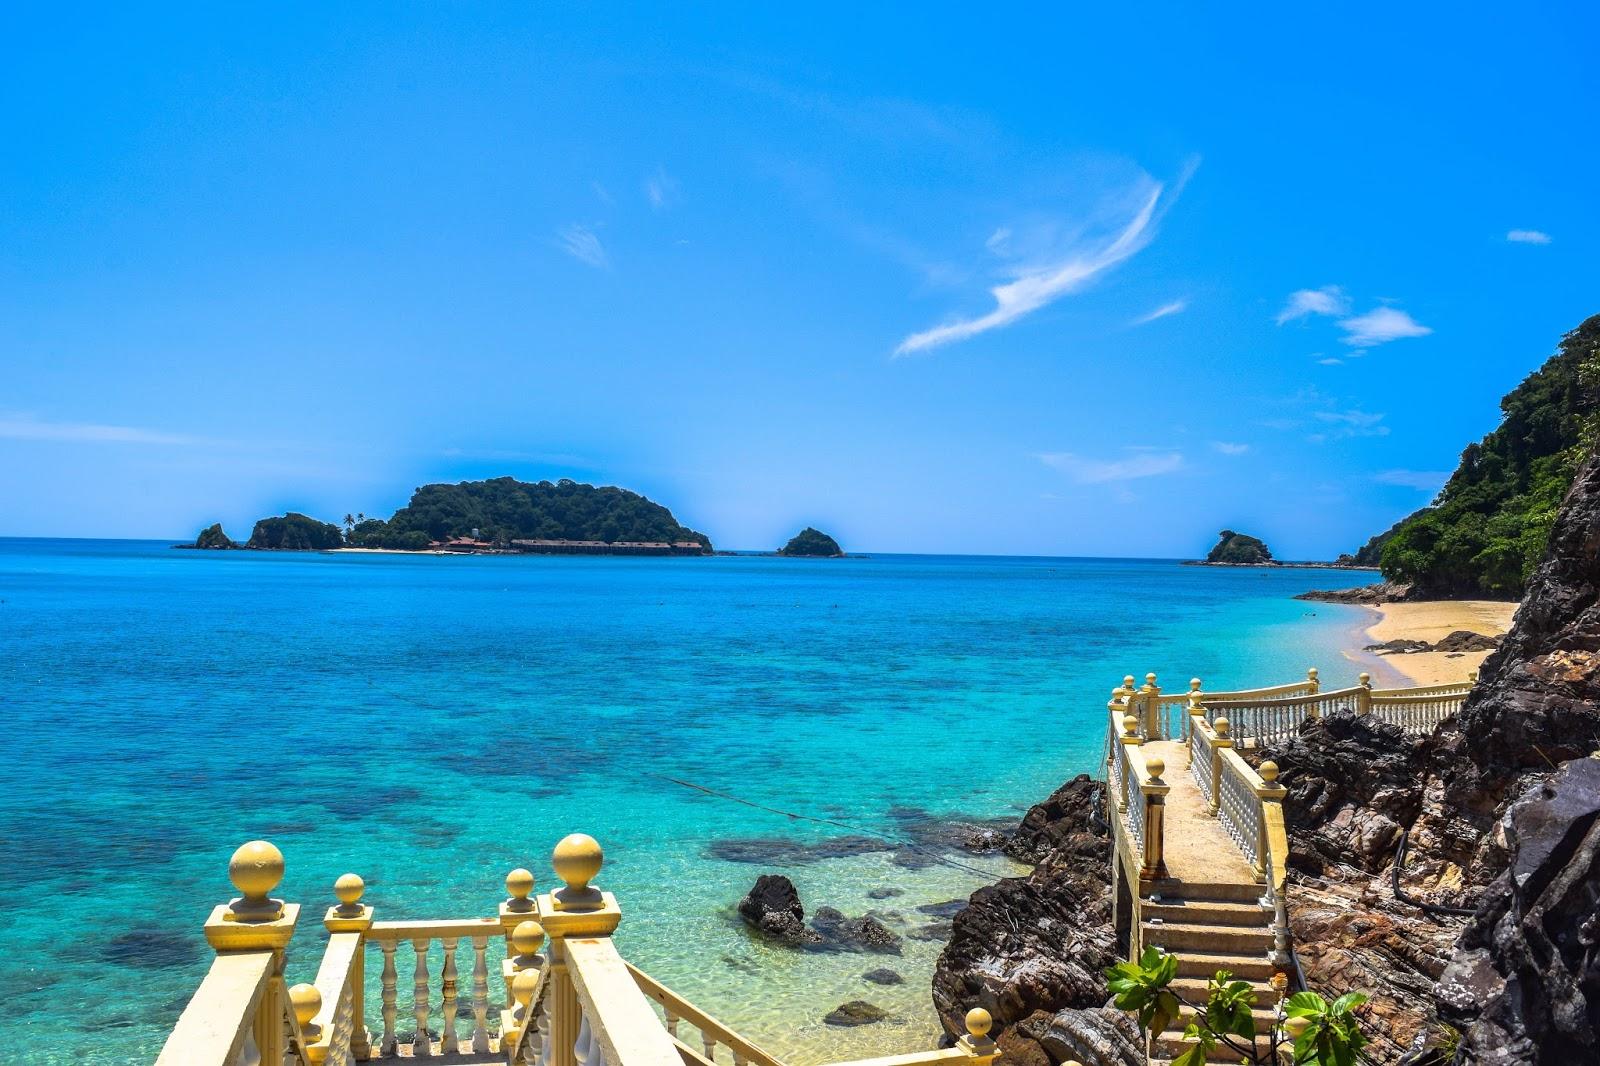 Kapas Island Or Fondly Known As U Is A Resort Located Off The Coast Of Marang Town Terengganu In Peninsular Malaysia